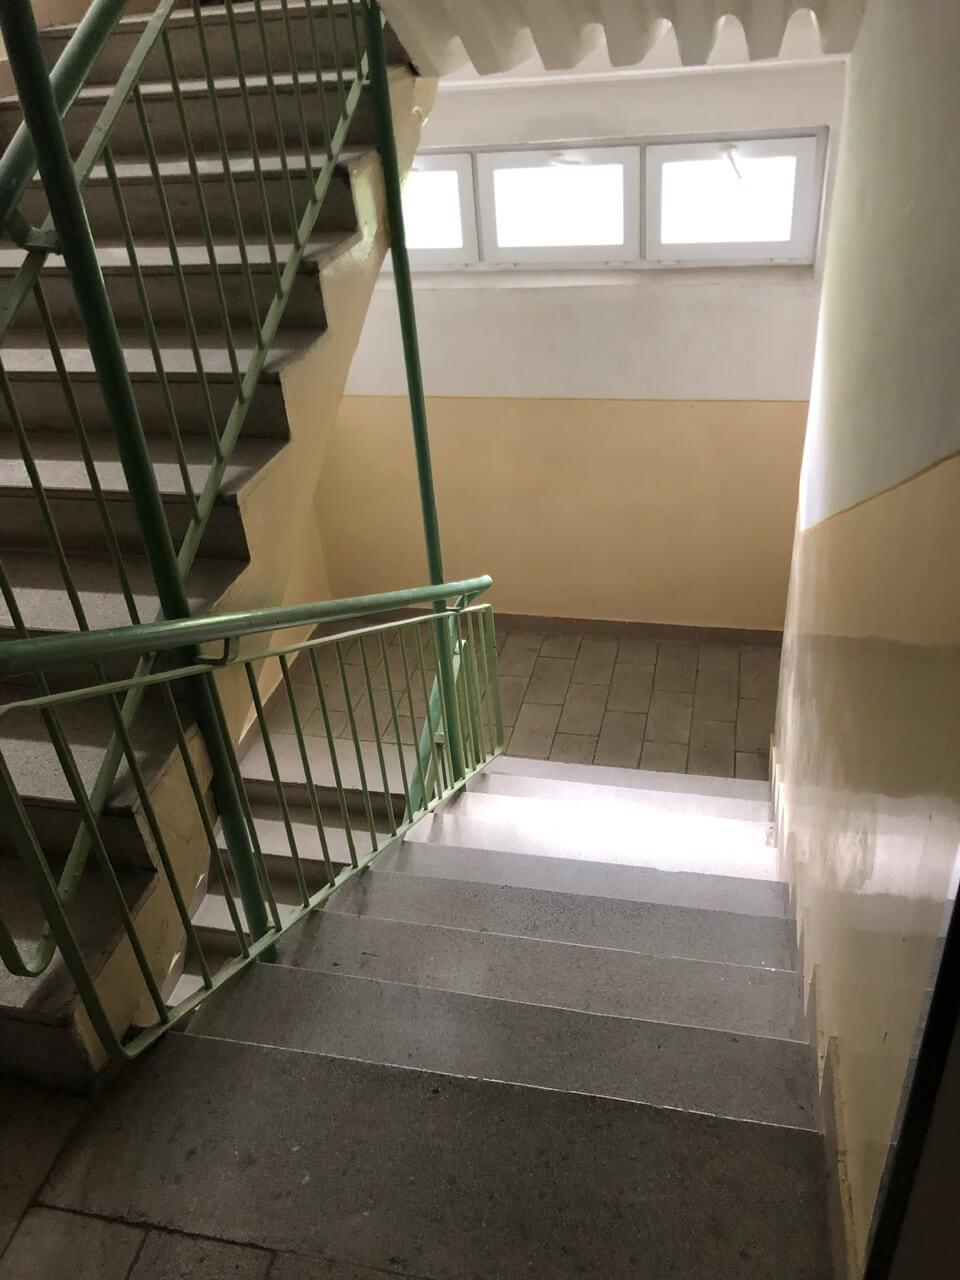 3 izbový byt, Račianska 85, 63m2, balkon 10m2, výborná lokalita-22